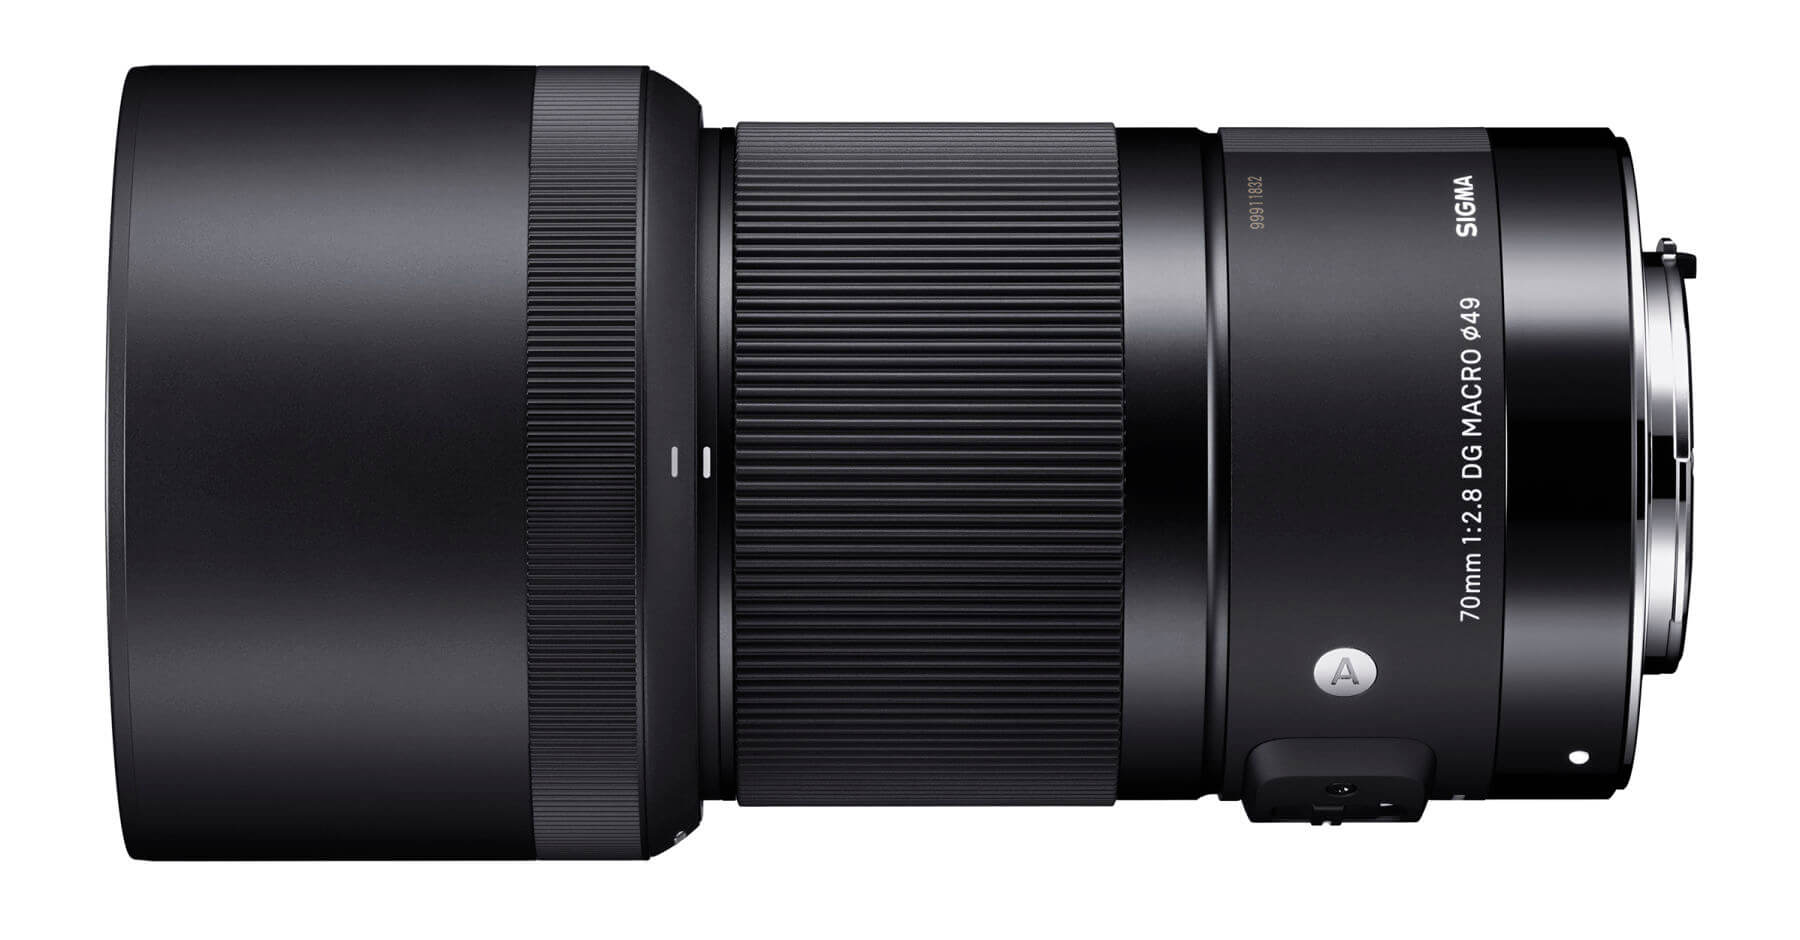 70mm F2.8 DG Macro Art Canon vatting